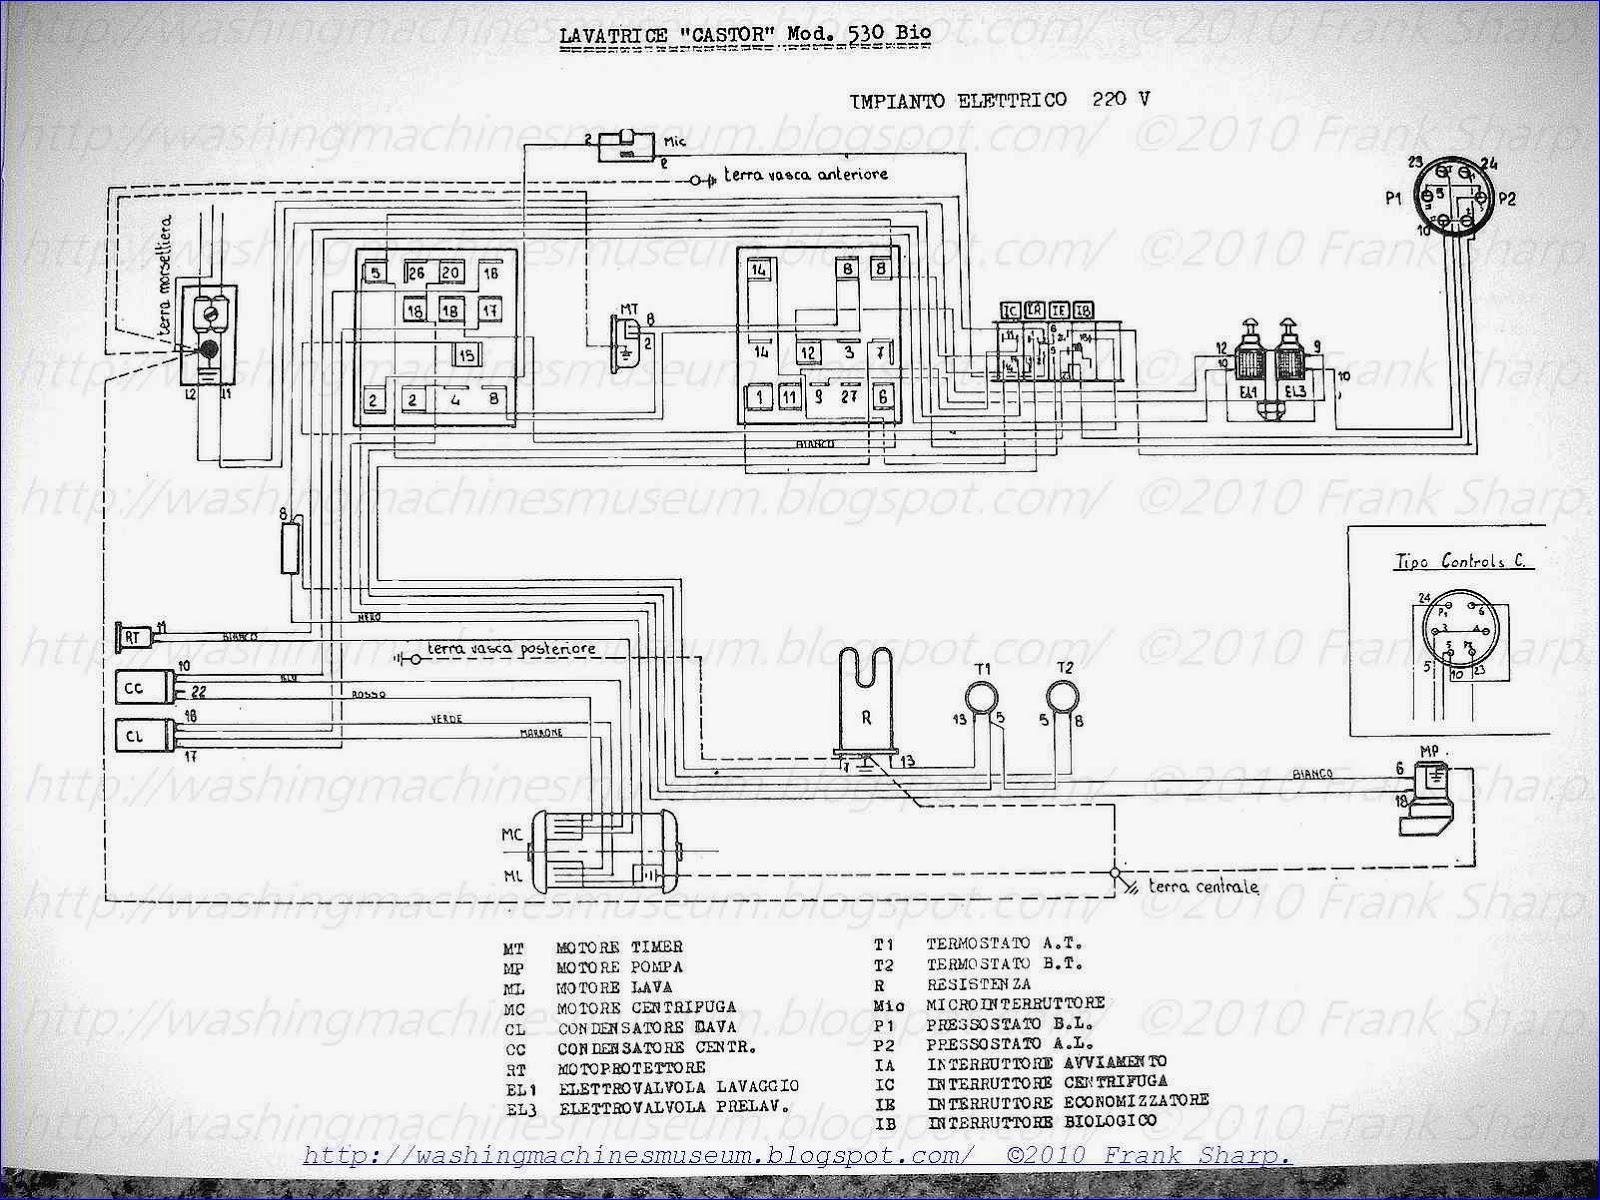 Castor Mod 530 Bio Schematic Diagram likewise Hobart Lt1 Wiring Diagram Wiring Diagrams additionally Parts Bin Rack likewise Stero Dishwasher Wiring Diagram further Blodgett Wiring Diagrams. on stero dishwasher wiring diagrams